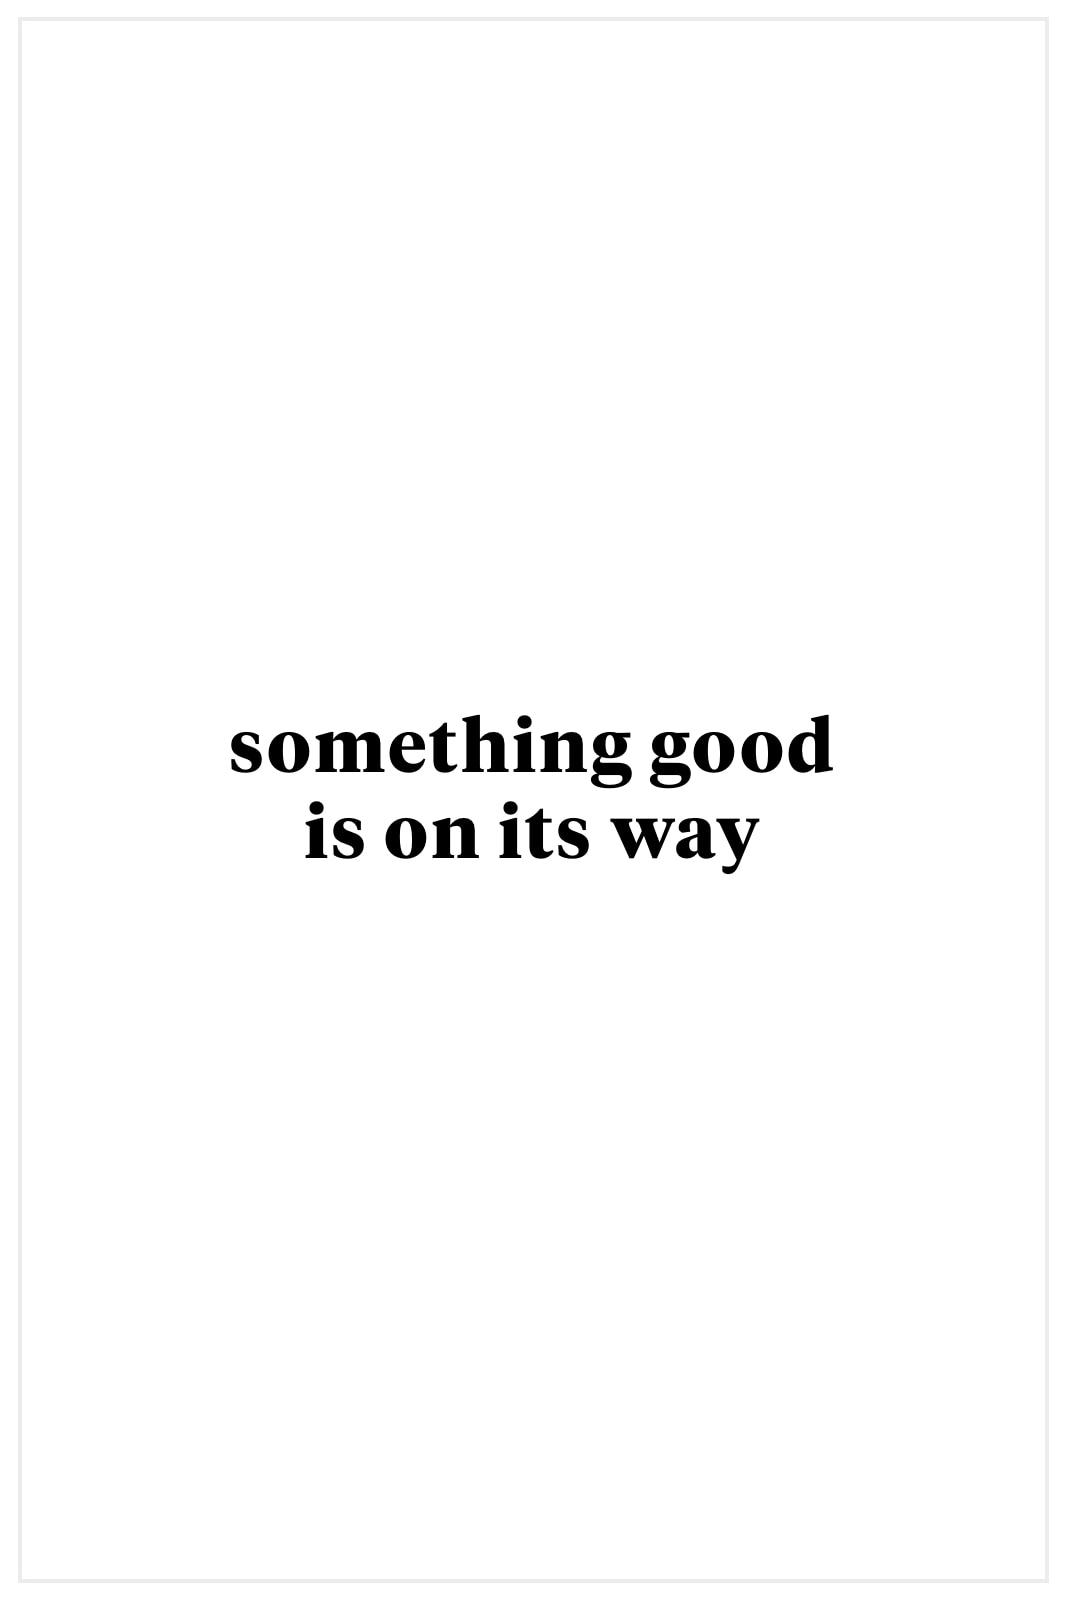 David lerner Rock and Roll Tee